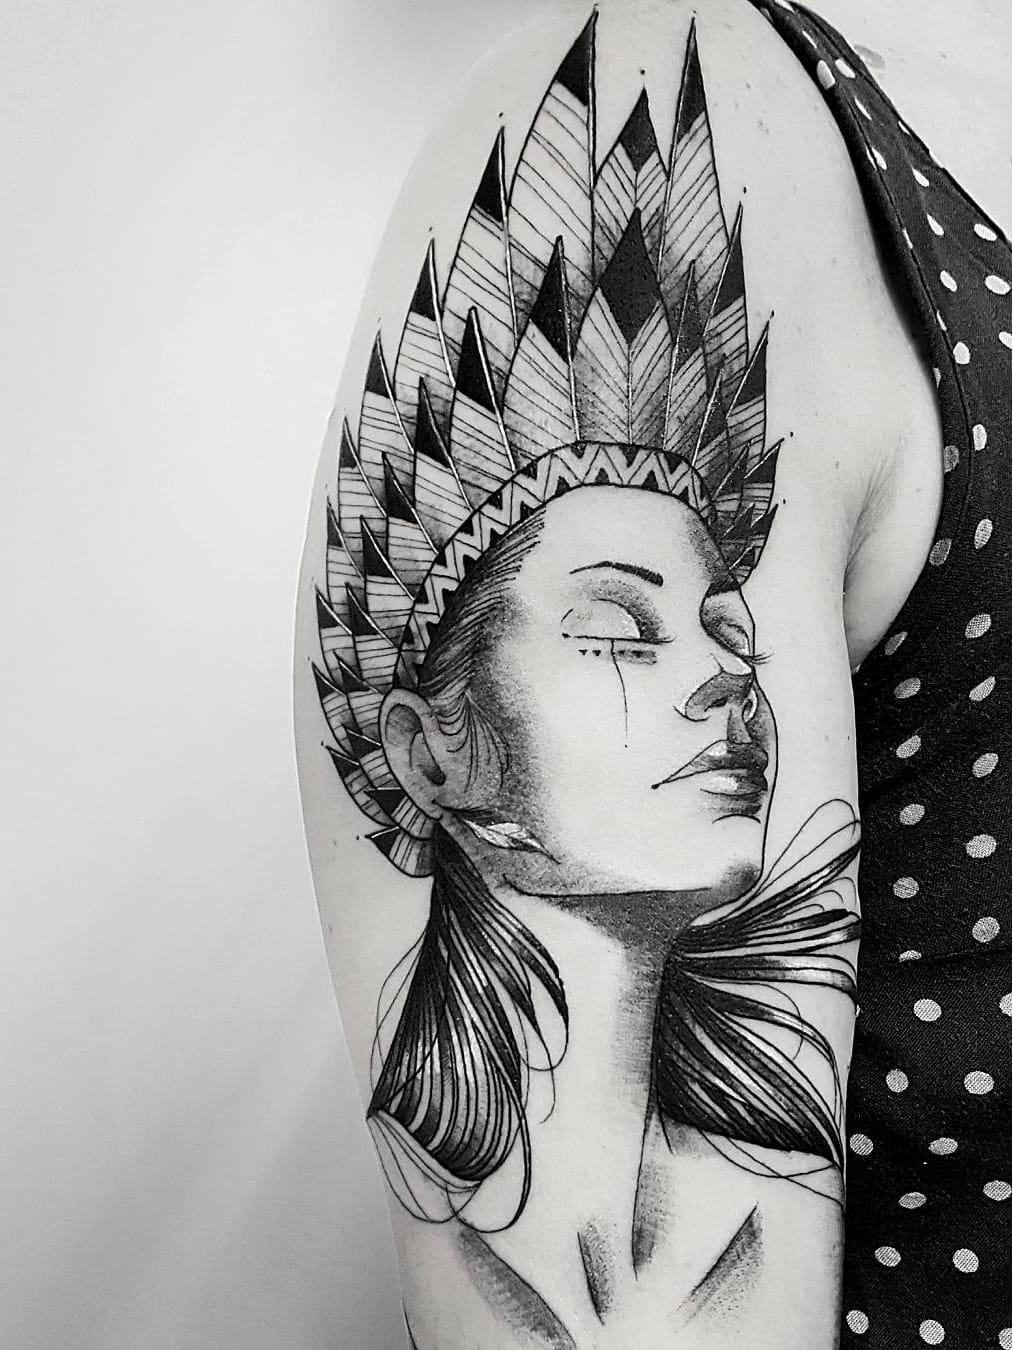 #LeoMarsiglia #brasil #brazil #brazilianartist #tatuadoresdobrasil #blackwork #fineline #pontilhismo #dotwork #woman #mulher #india #indian #native